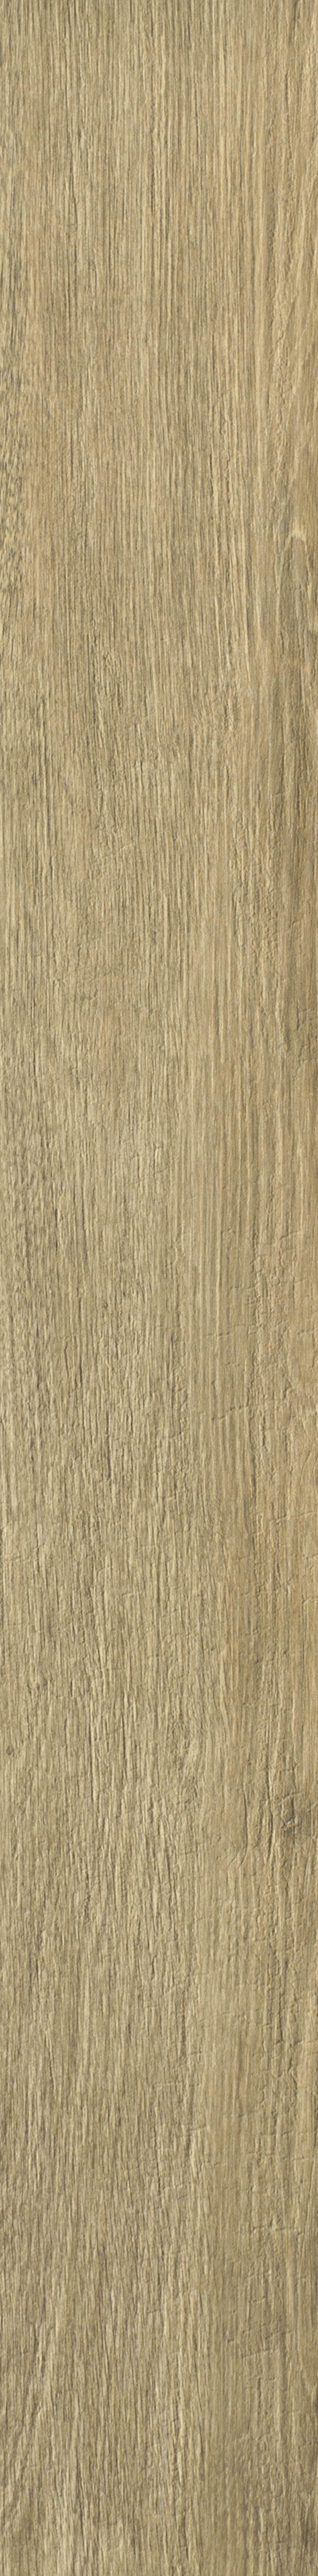 Płytka uniwersalna 14,8x119,8 cm  Paradyż Almonte Natural Gres Szkl. Rekt. Mat